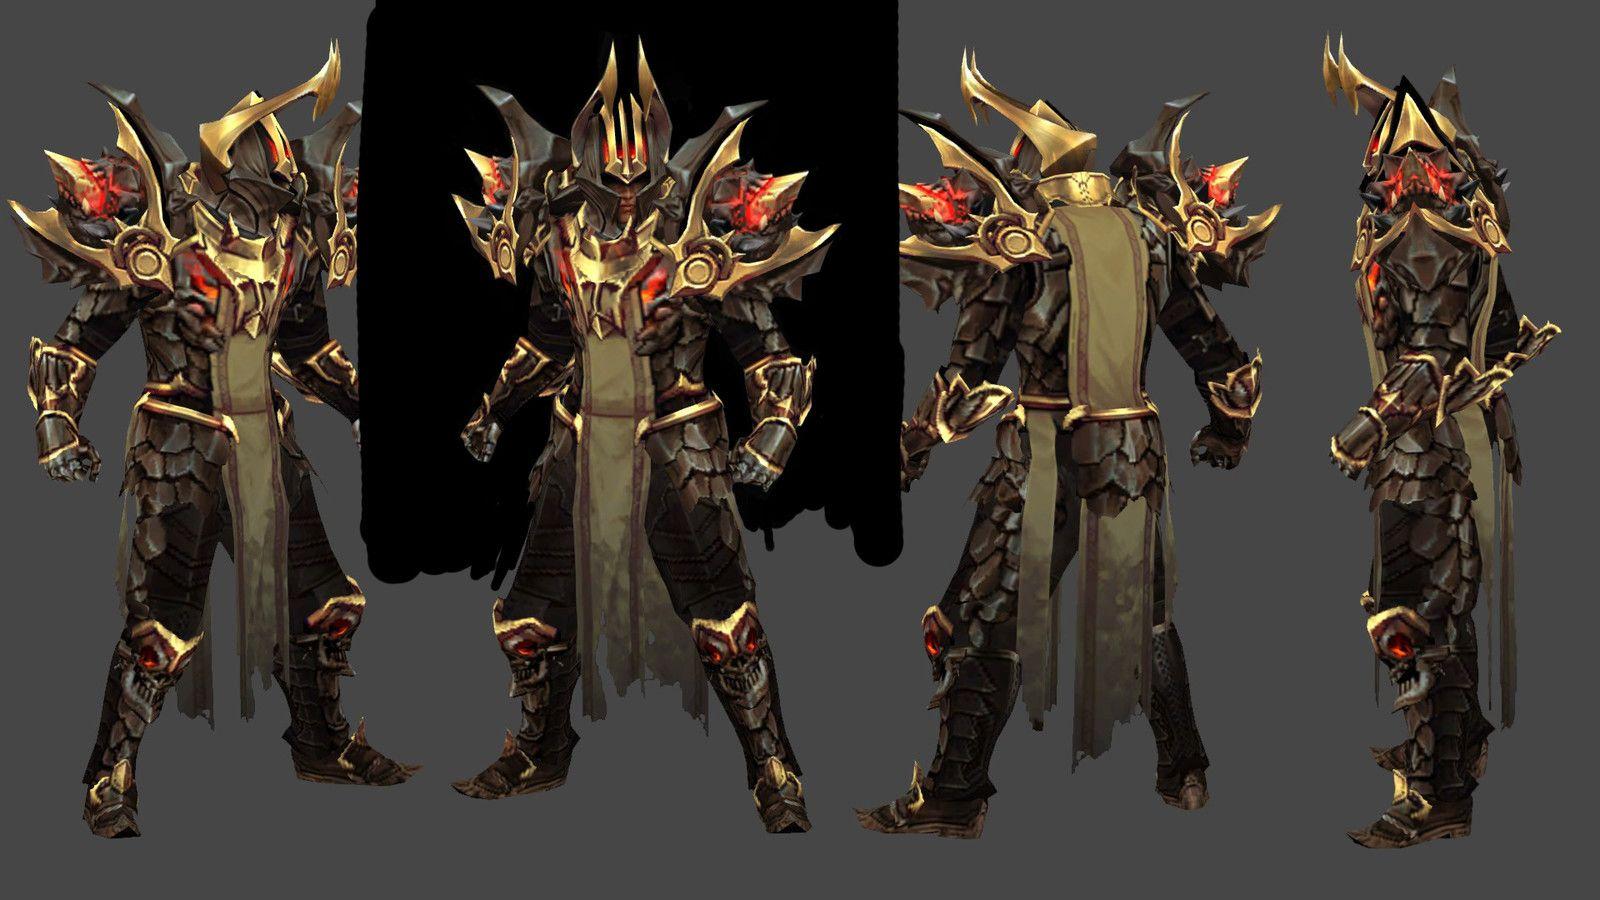 Diablo 3 Reaper Of Souls Akkhan Set Vitaliy Naymushin On